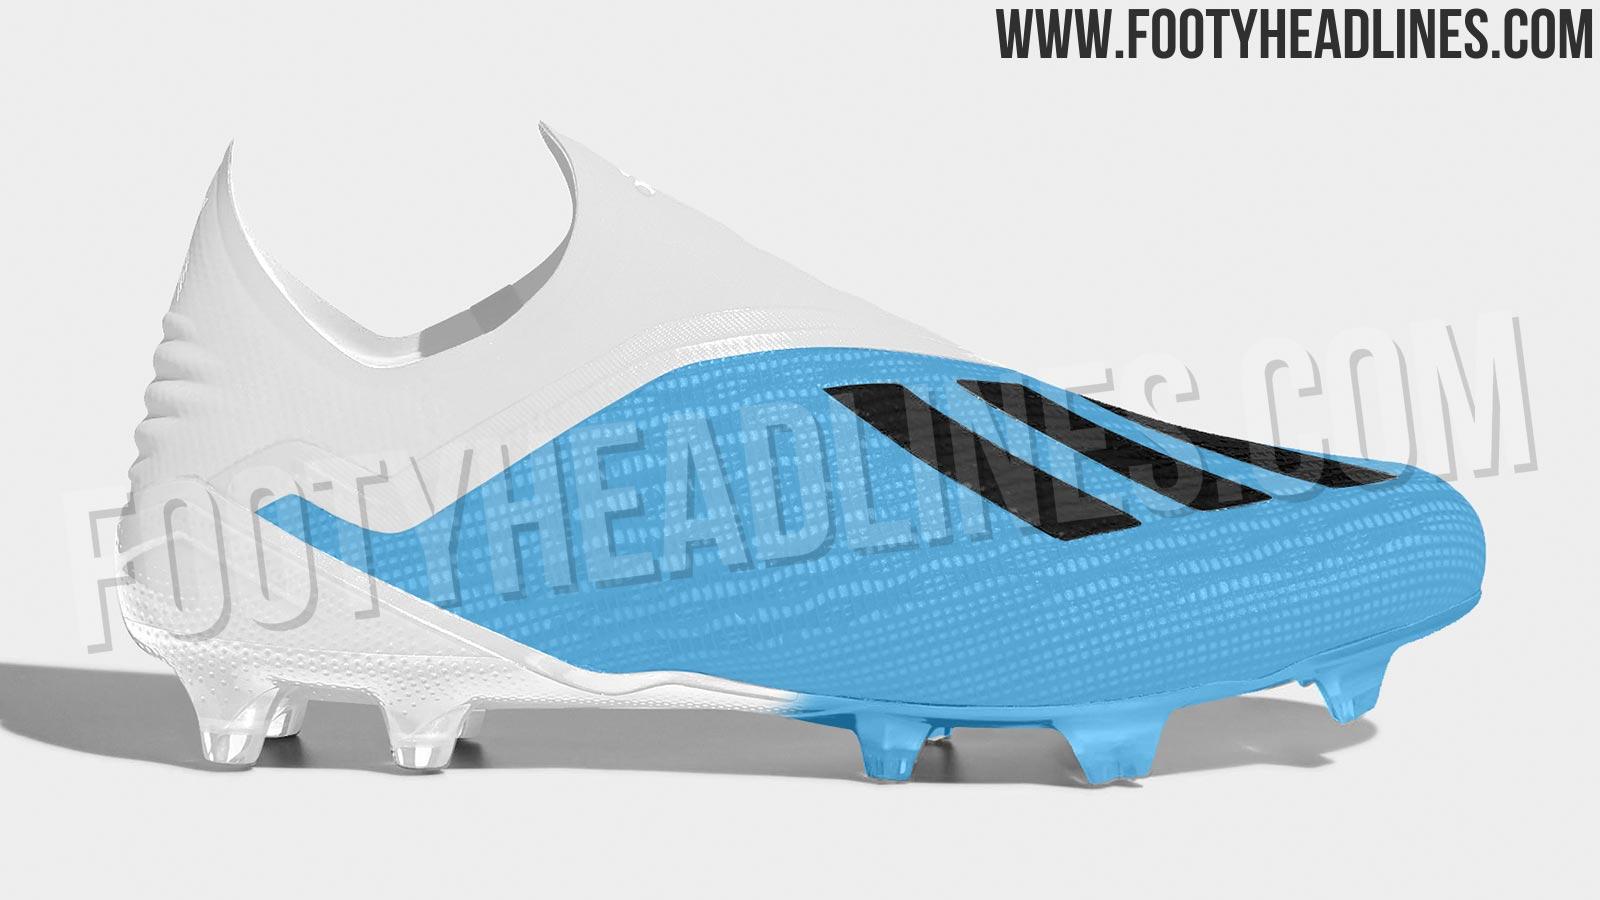 official images sale uk new cheap Ft. Next-Gen Nemeziz & X - Adidas 'New Season' 2019-20 Boots ...